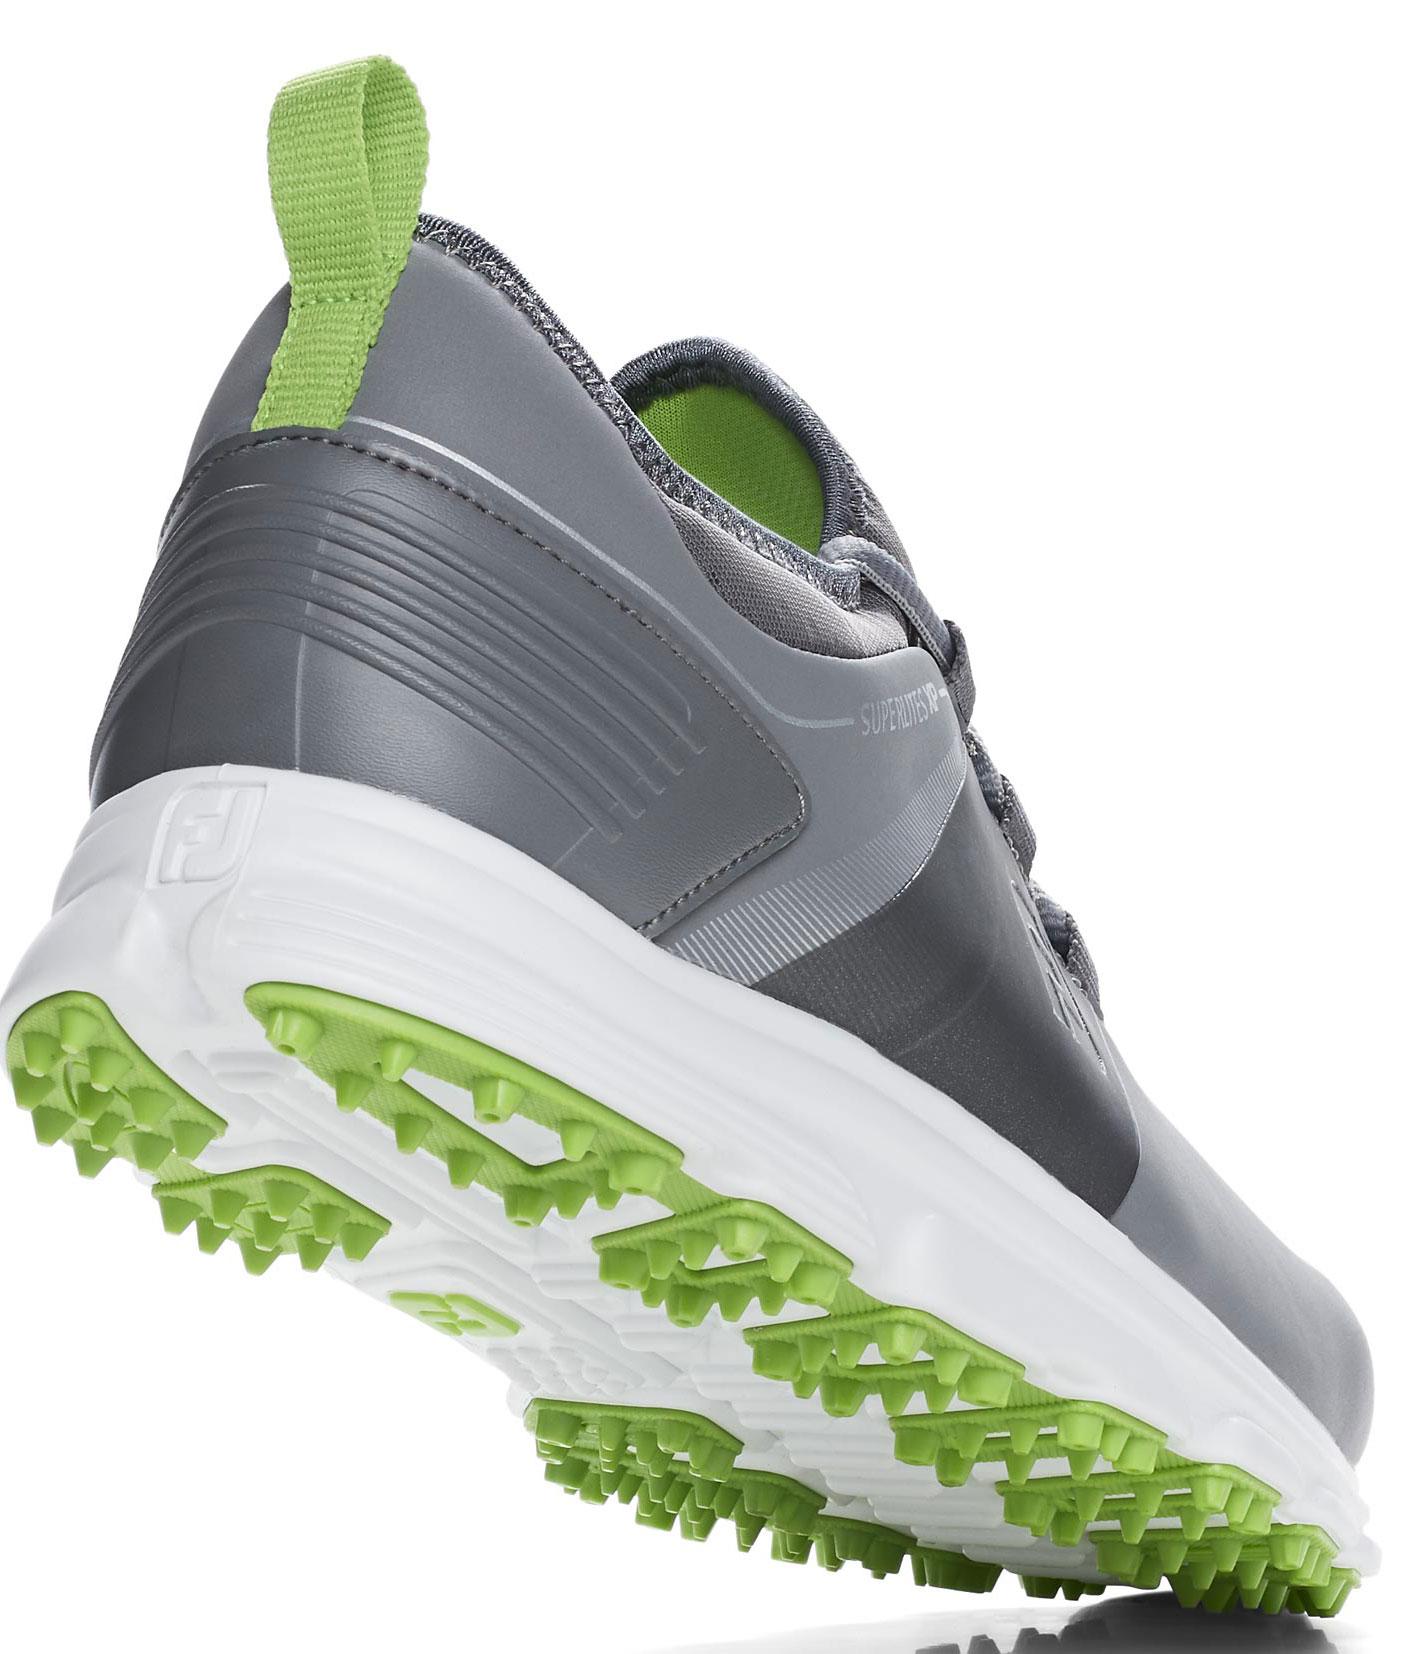 FootJoy-Superlites-XP-Golf-Shoes-Men-039-s-New thumbnail 7